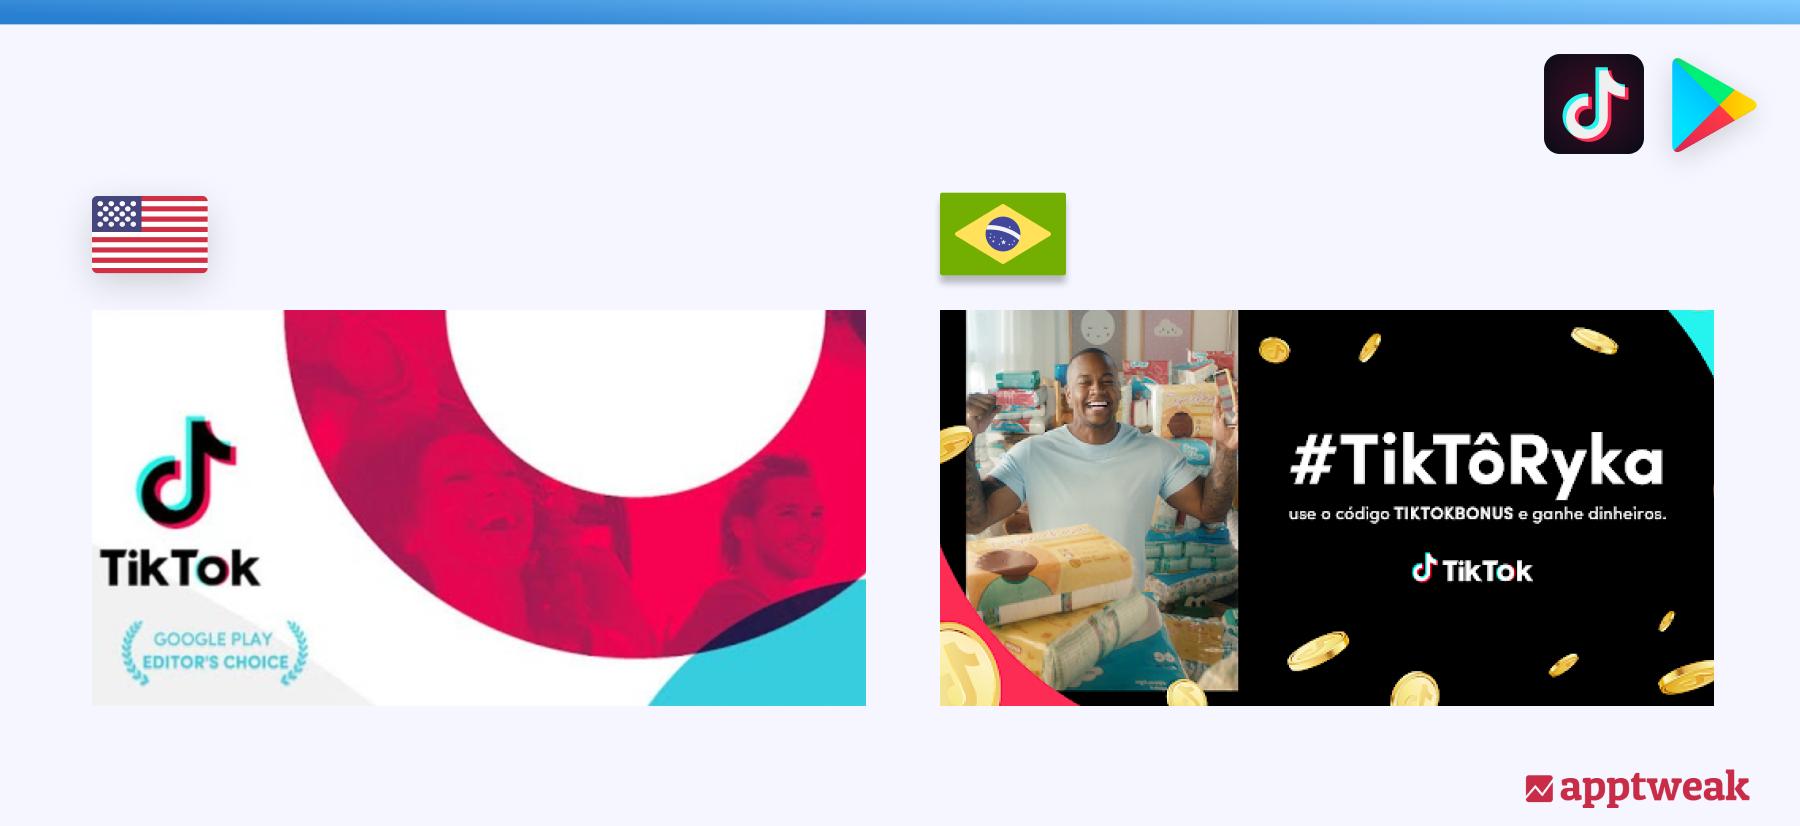 TikTok's Feature Graphic in the Brazilian Google Play Store, 2021